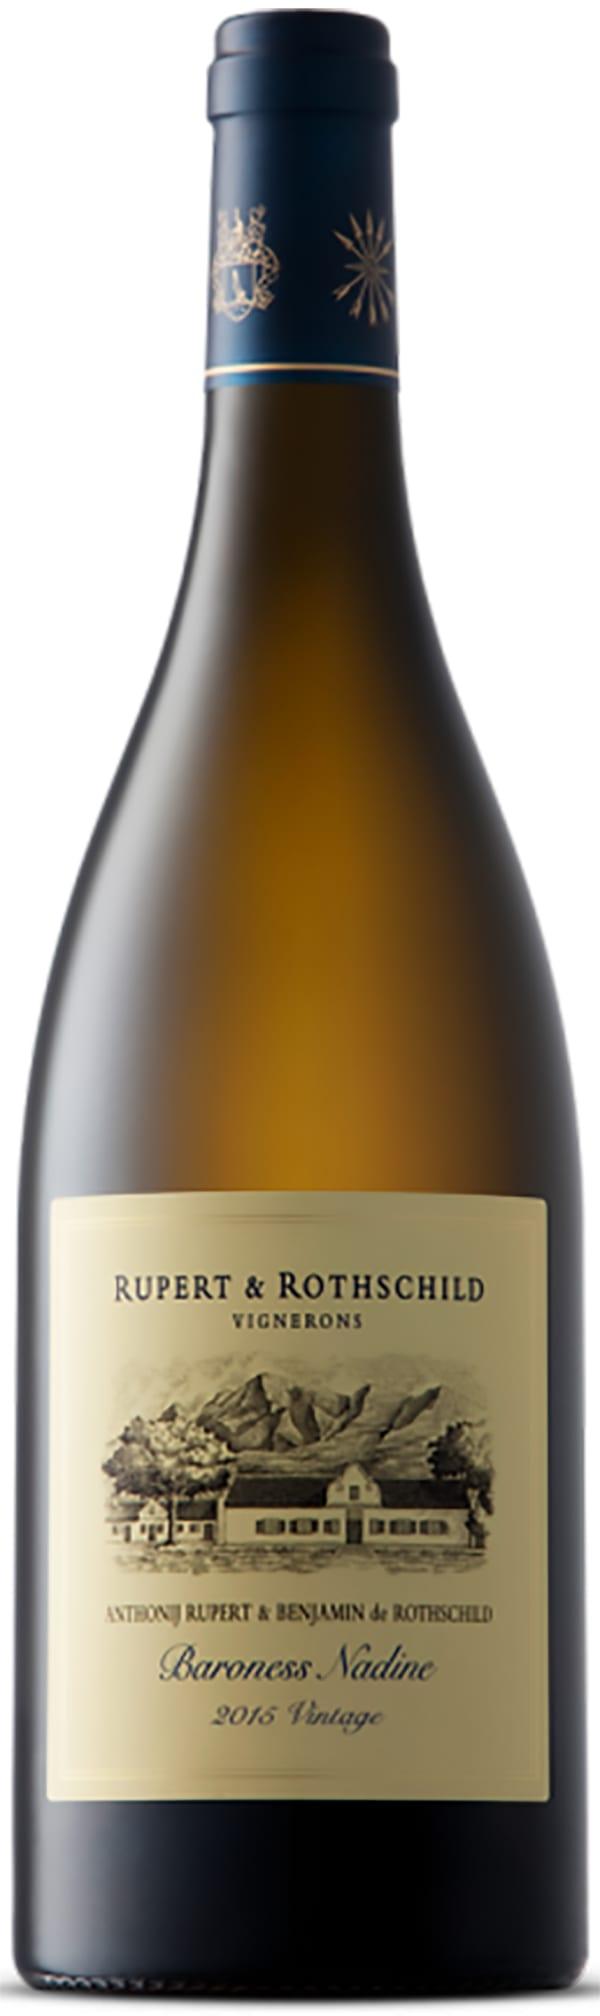 Rupert & Rothschild Chardonnay Baroness Nadine 2010